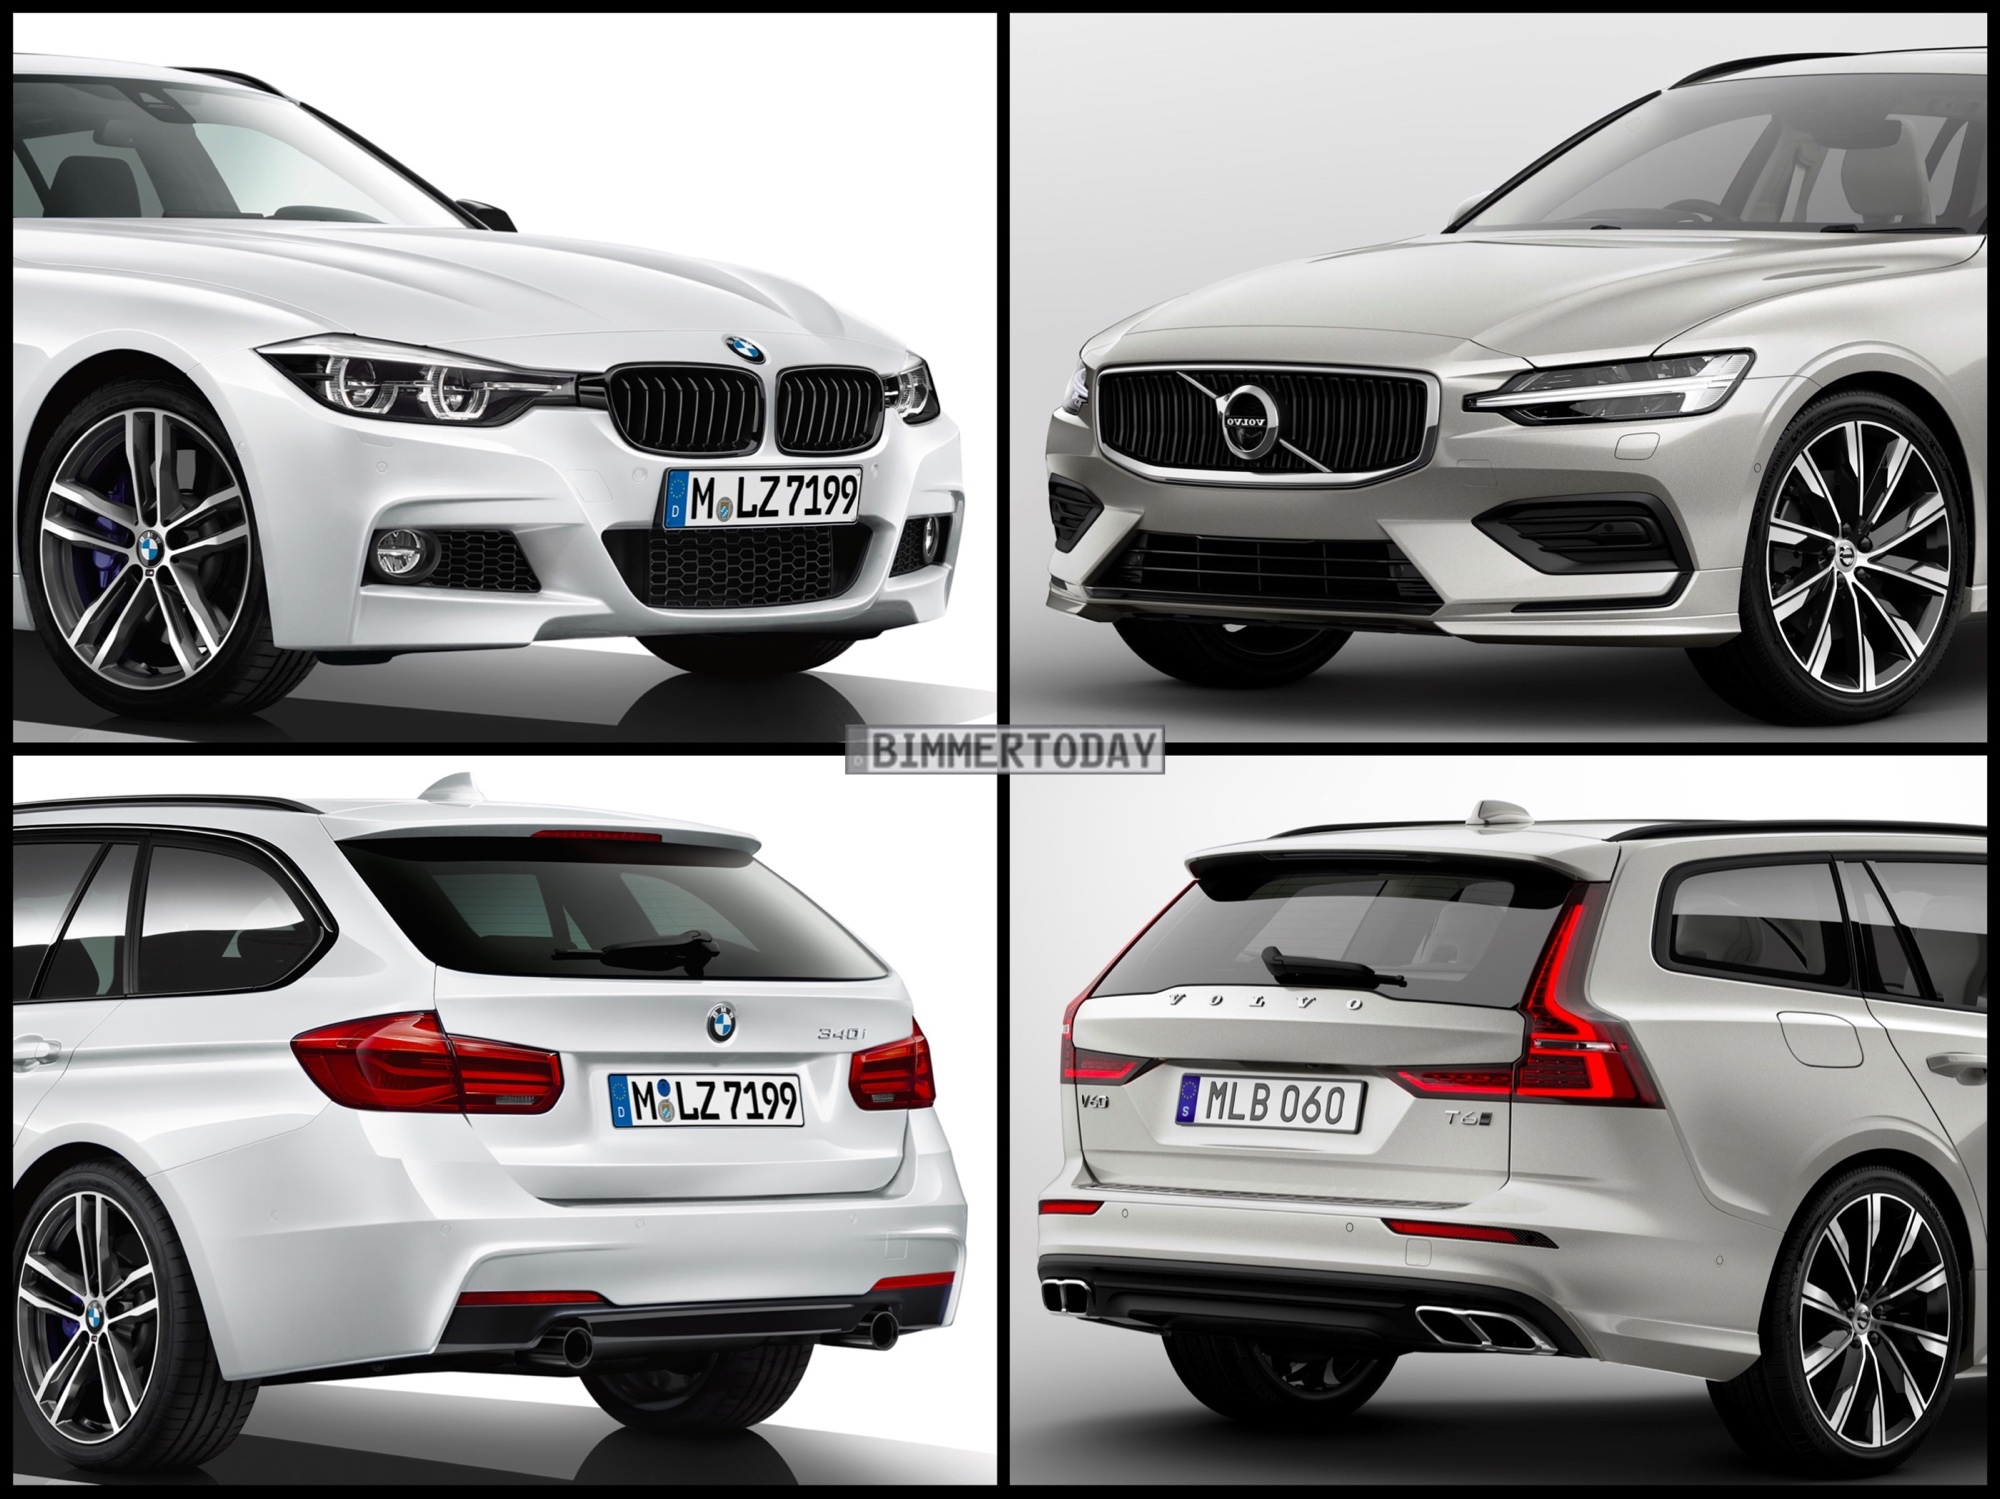 Bild Vergleich BMW 3er F31 Touring Volvo V60 T6 2018 01